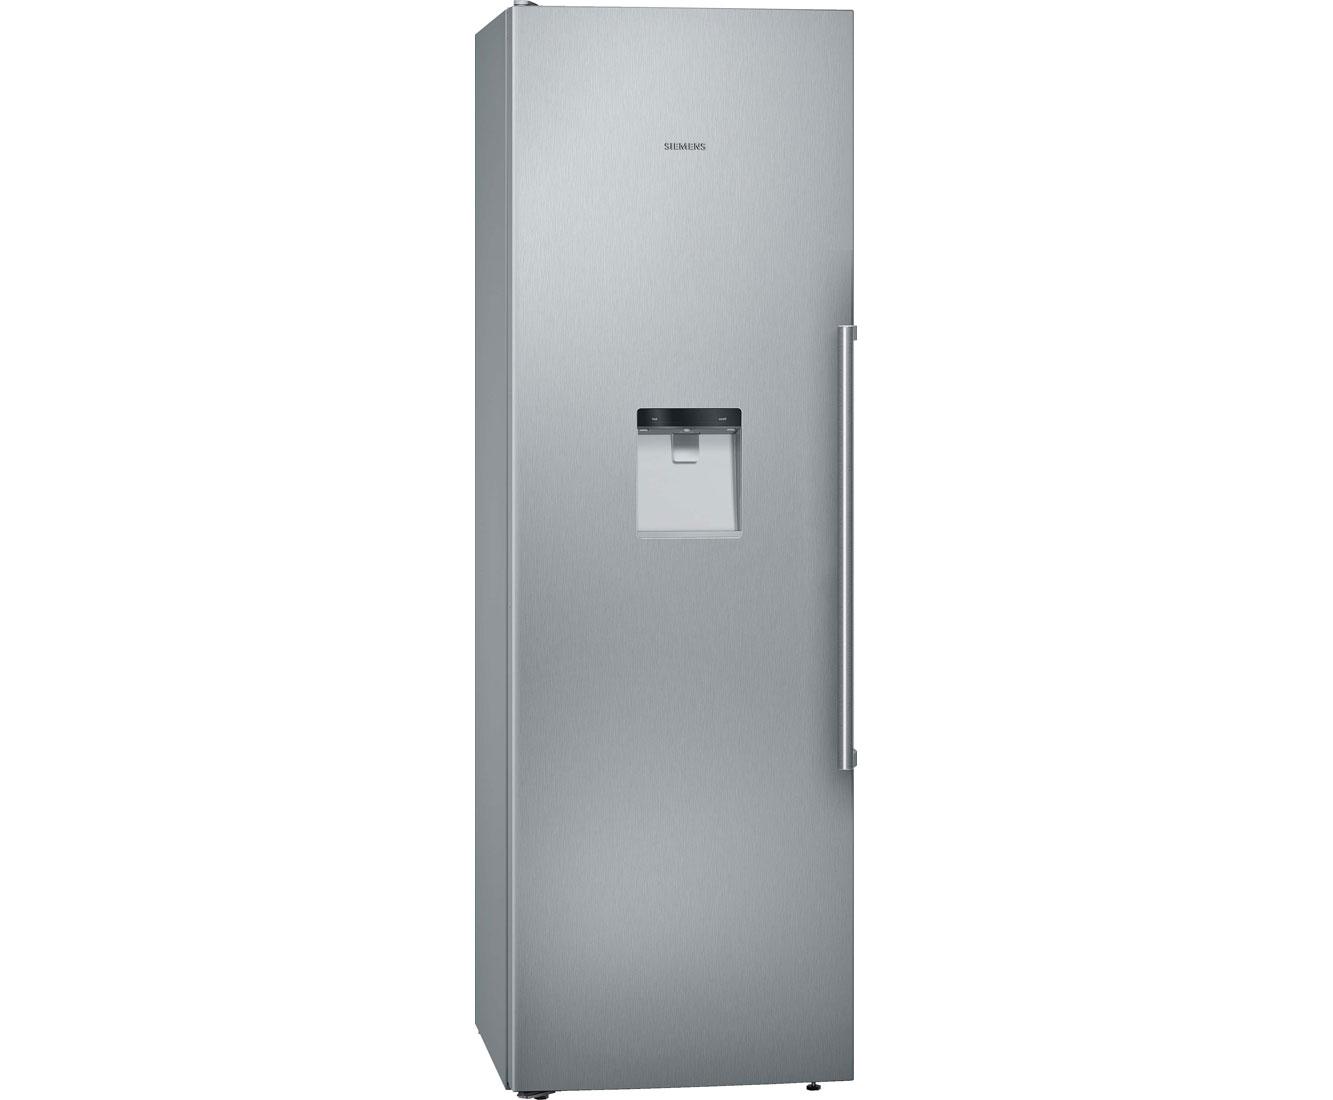 Smeg Kühlschrank Sale : Kühlschrank preisvergleich günstig kühlschrank kaufen